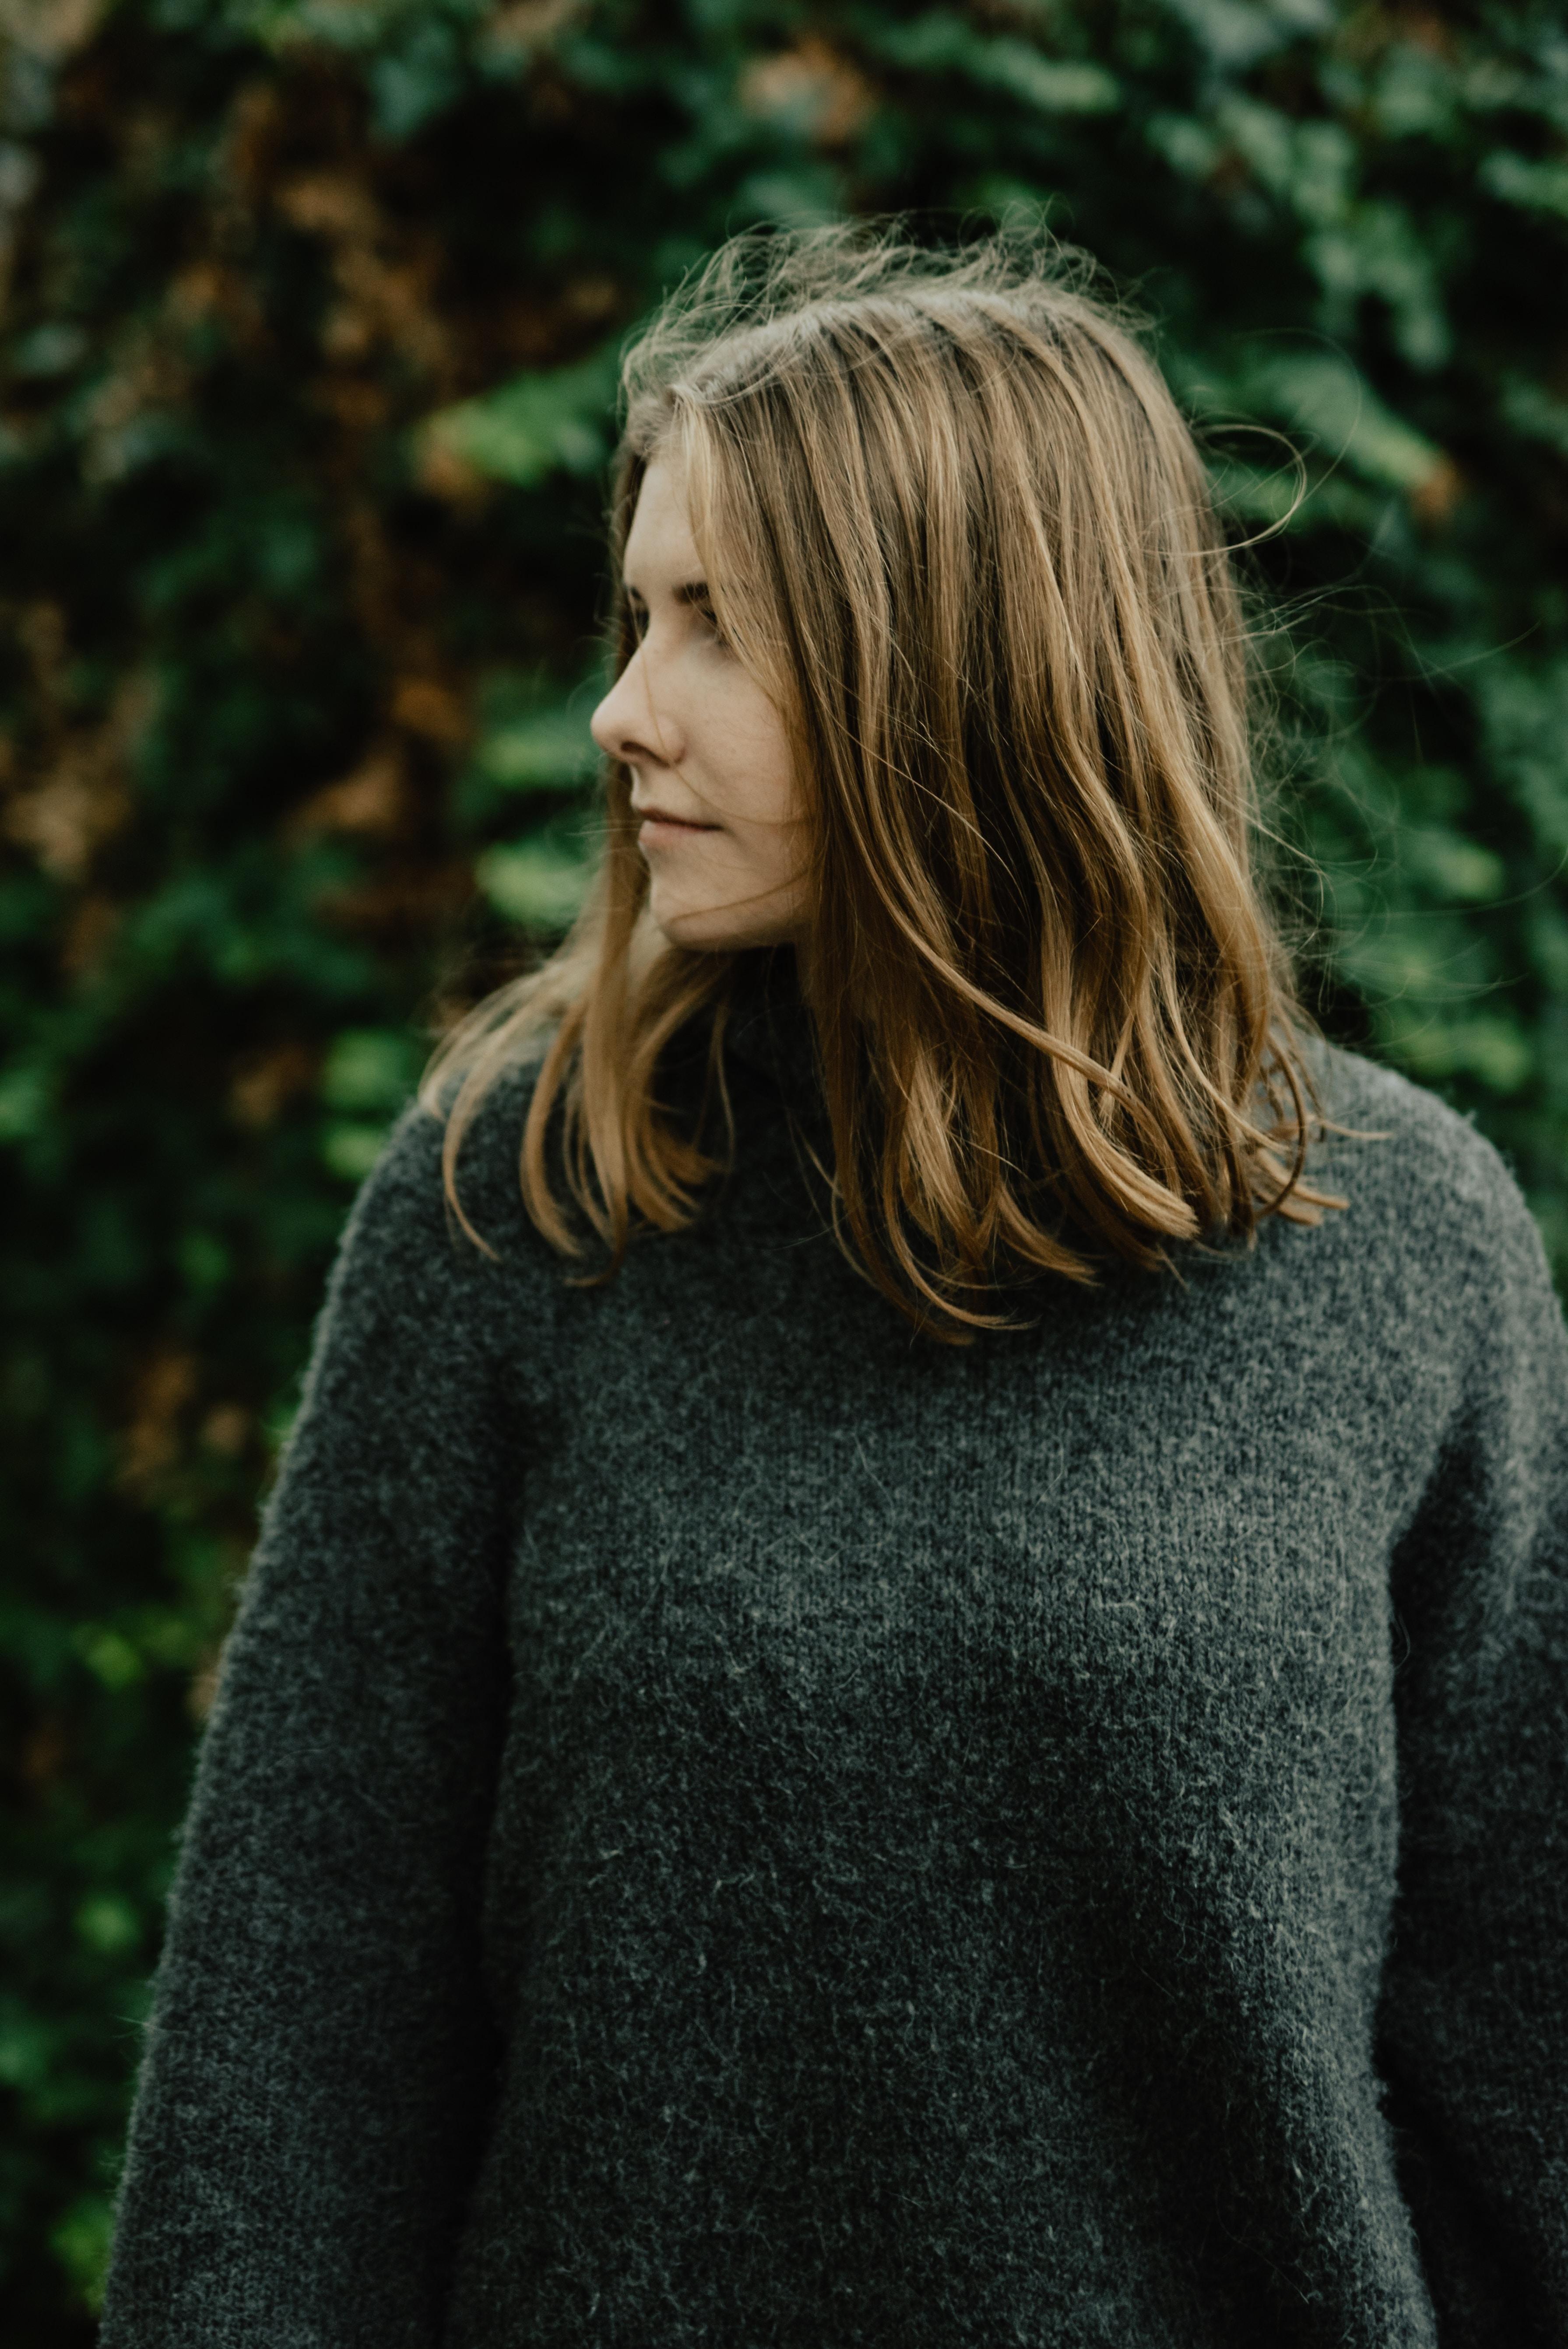 portrait photography of woman looking sideways